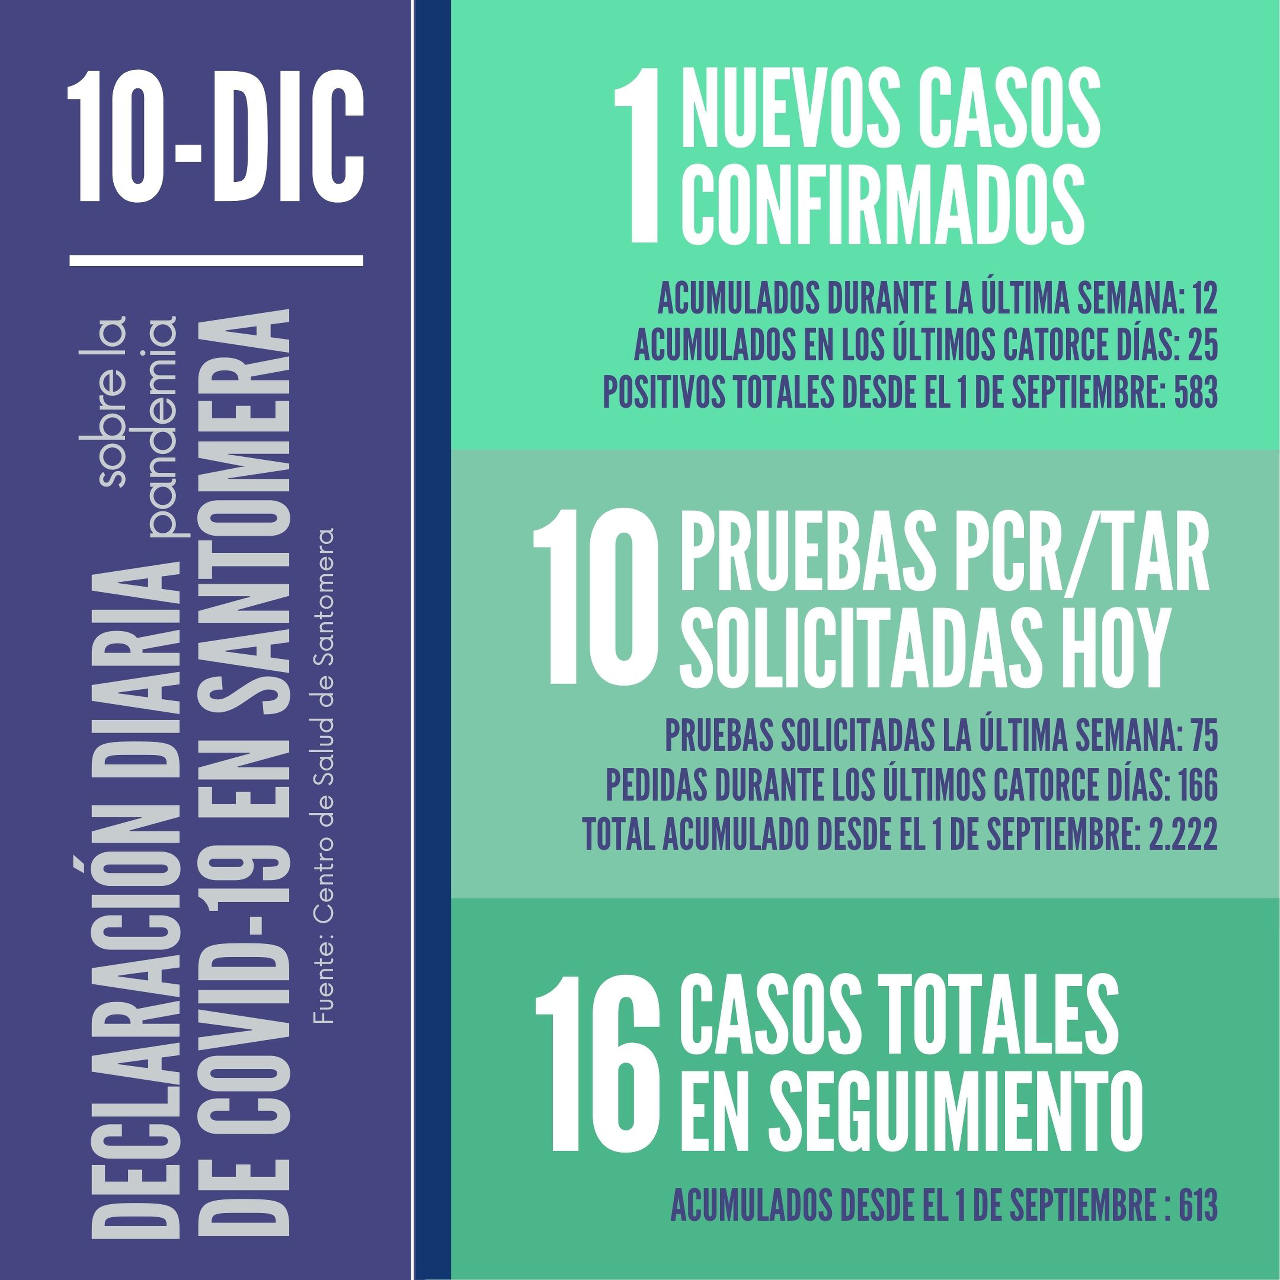 20201210_Datos COVID-19 Santomera